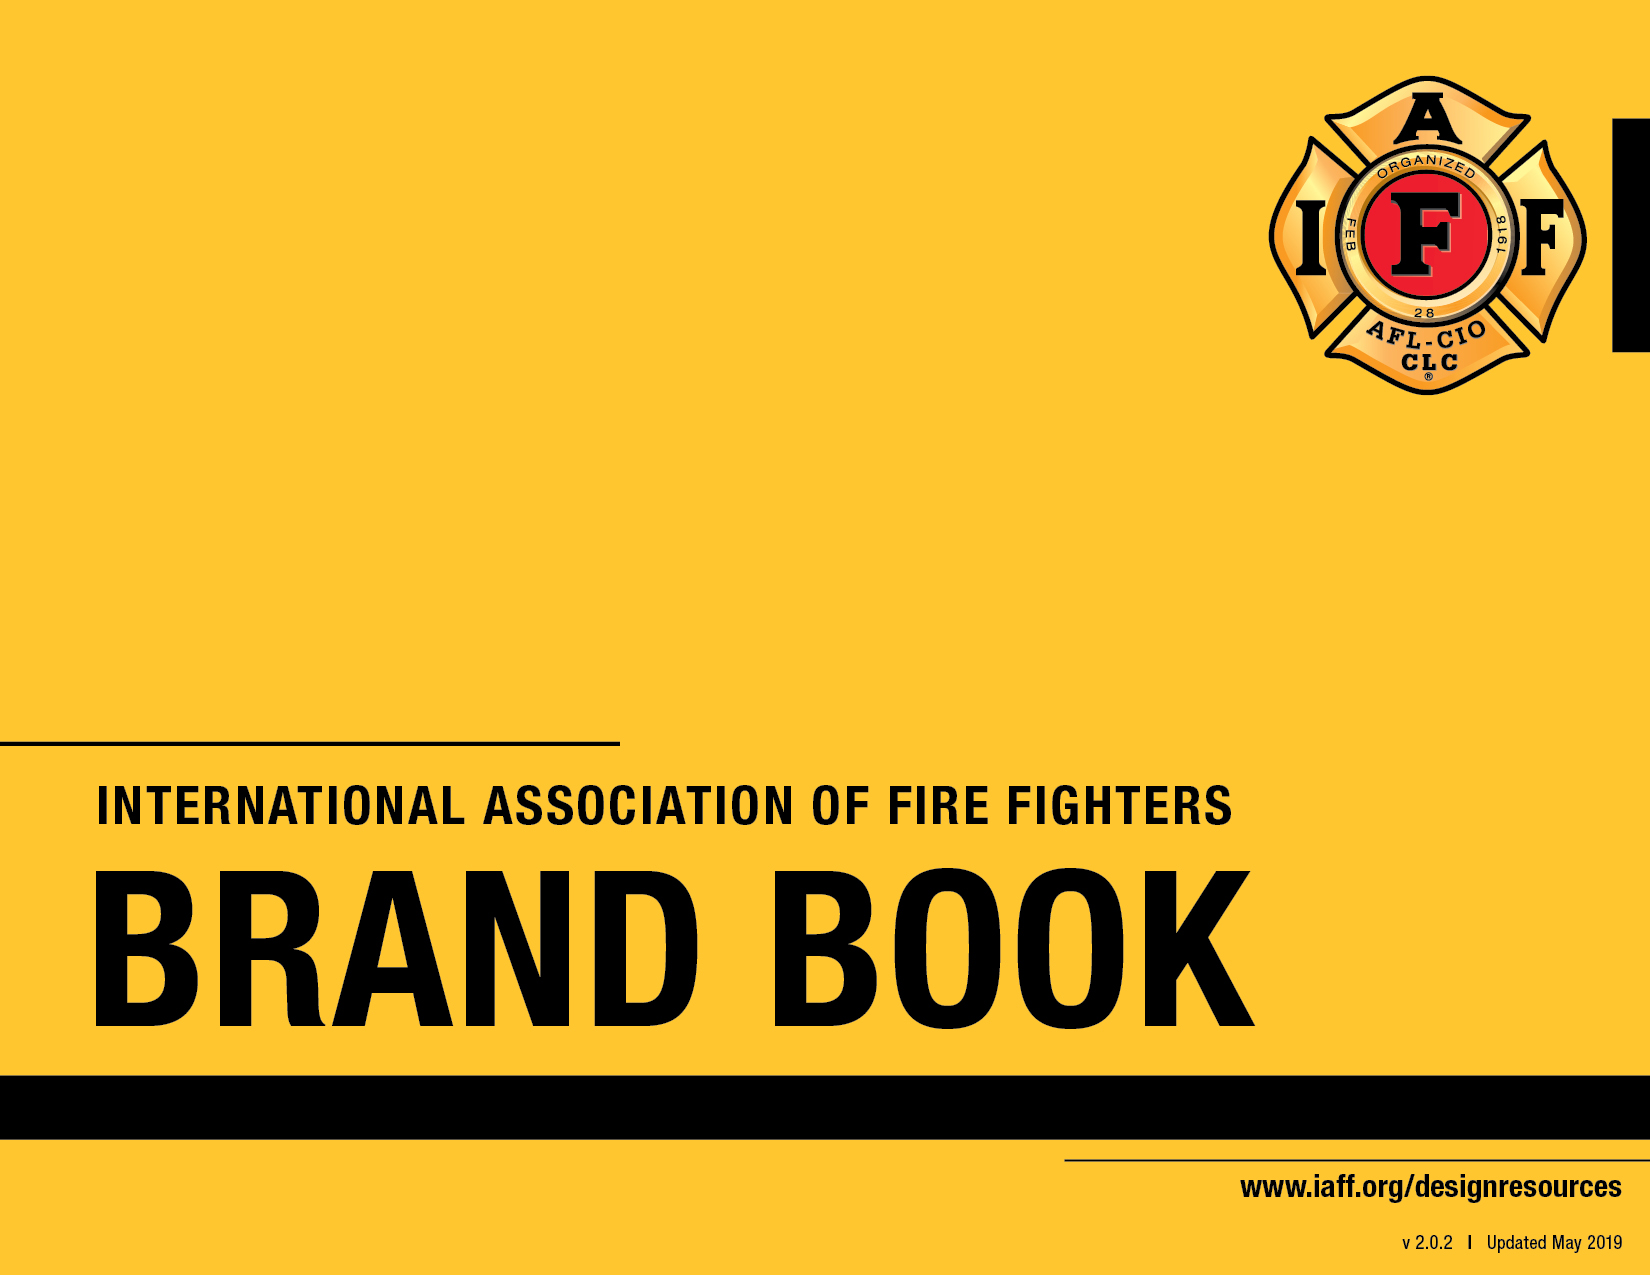 IAFF-BrandBook2019_v2.0.2cover.jpg